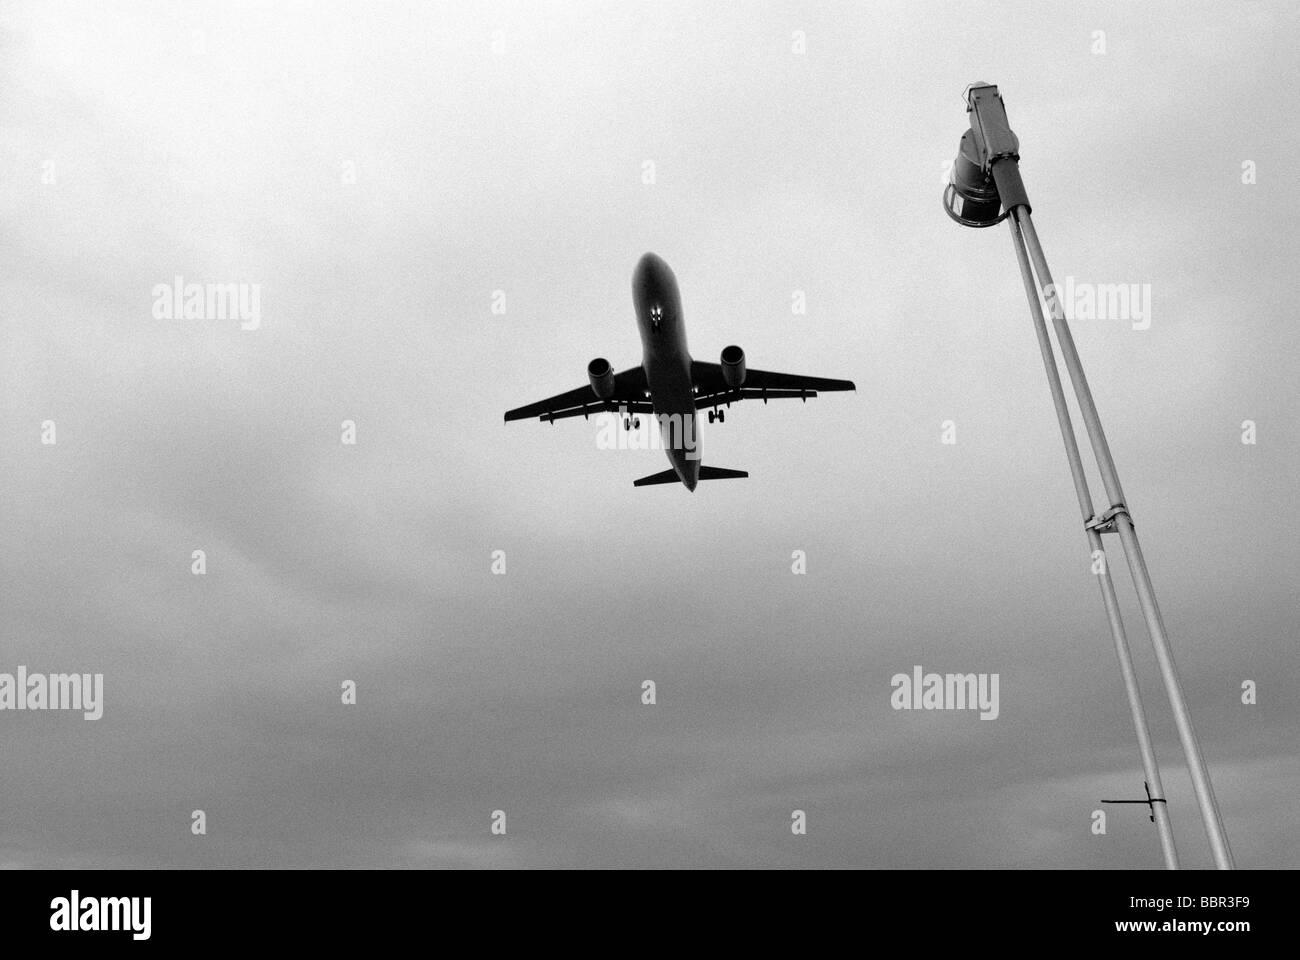 AIRCRAFT DURING LANDING - Stock Image